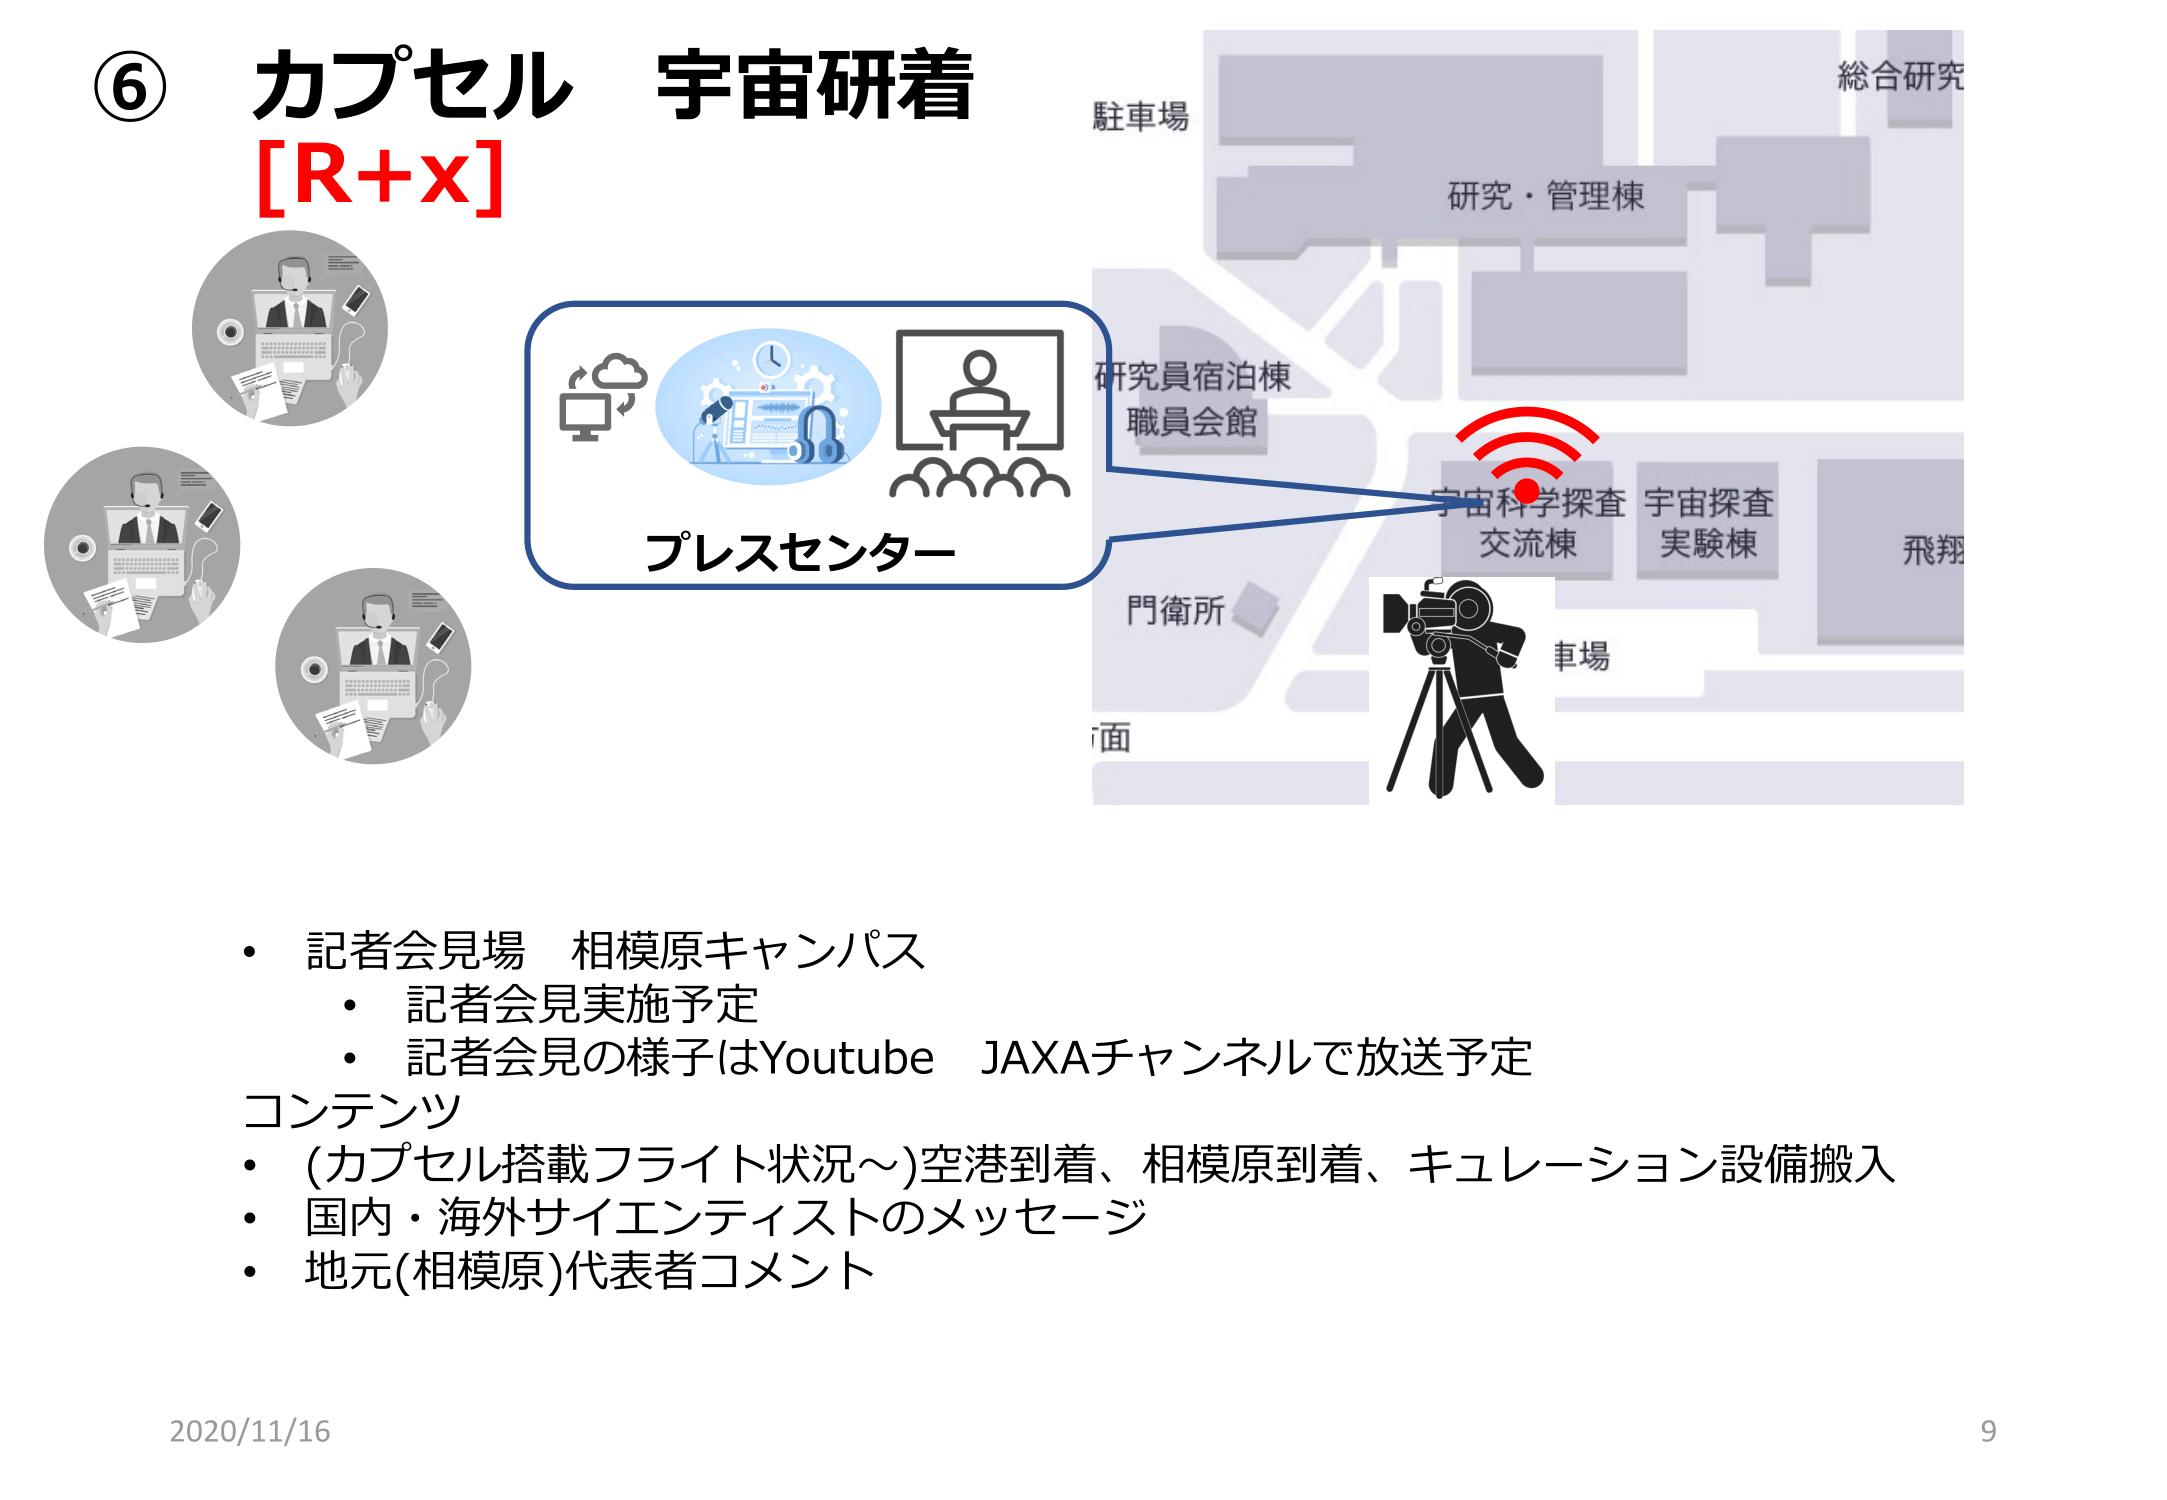 f:id:Imamura:20201117222250p:plain